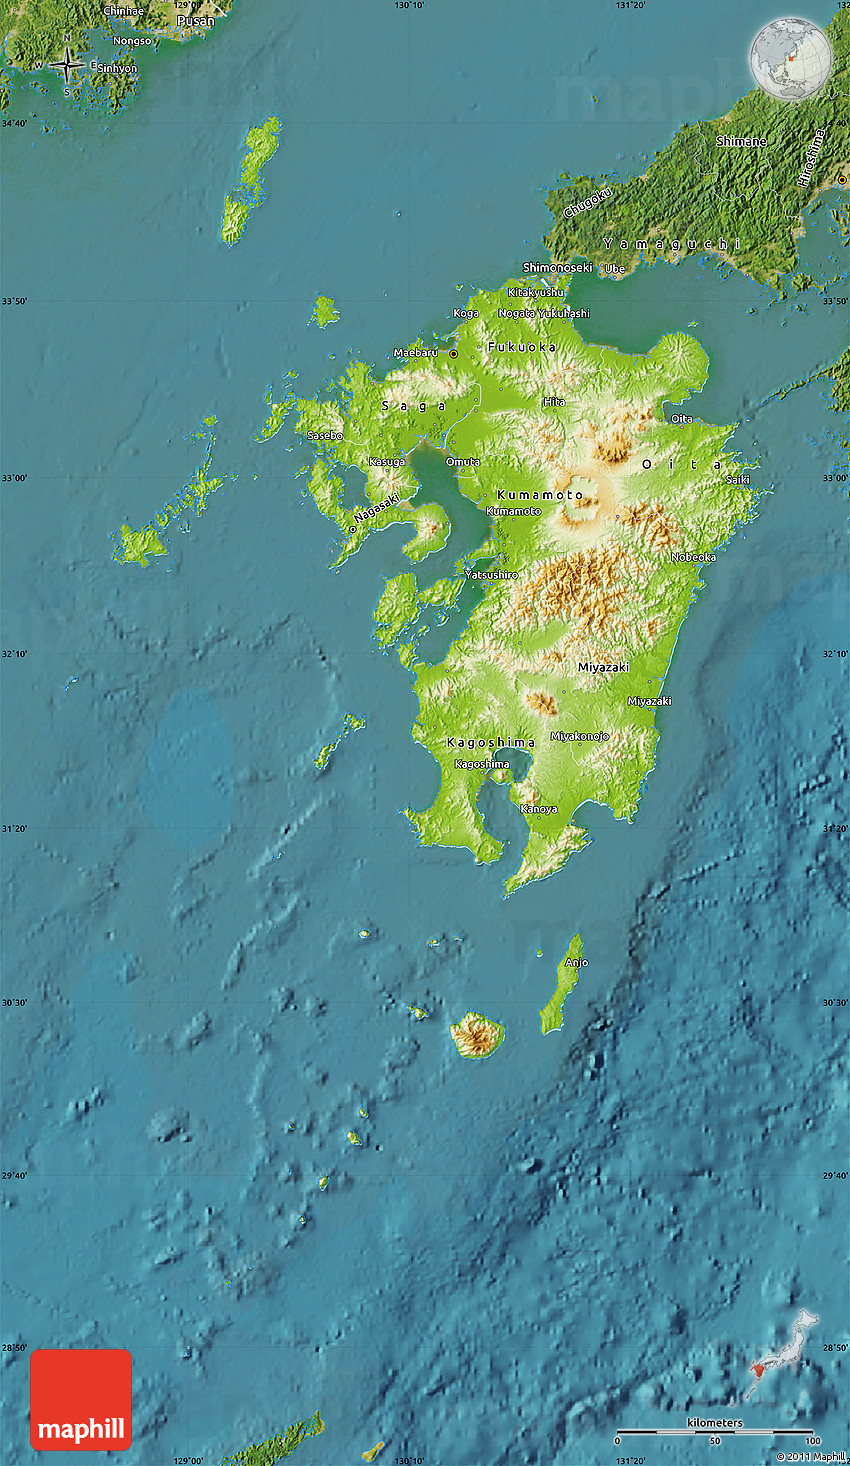 Physical Map of Kyushu, satellite outside on hainan map, okinawa island, fukuoka map, kuril islands, hiroshima map, sakhalin island map, ryukyu islands map, miyazaki map, kagoshima prefecture, kanto map, japanese archipelago, japanese archipelago map, ryukyu islands, fukuoka prefecture, japan map, okinawa map, manchurian plain map, nagasaki prefecture, gobi desert map, shikoku map, sea of japan, japanese alps map, hokkaido map, honshu map, sumatra map, bangkok map, loess plateau map, kuril islands map, okinawa prefecture,